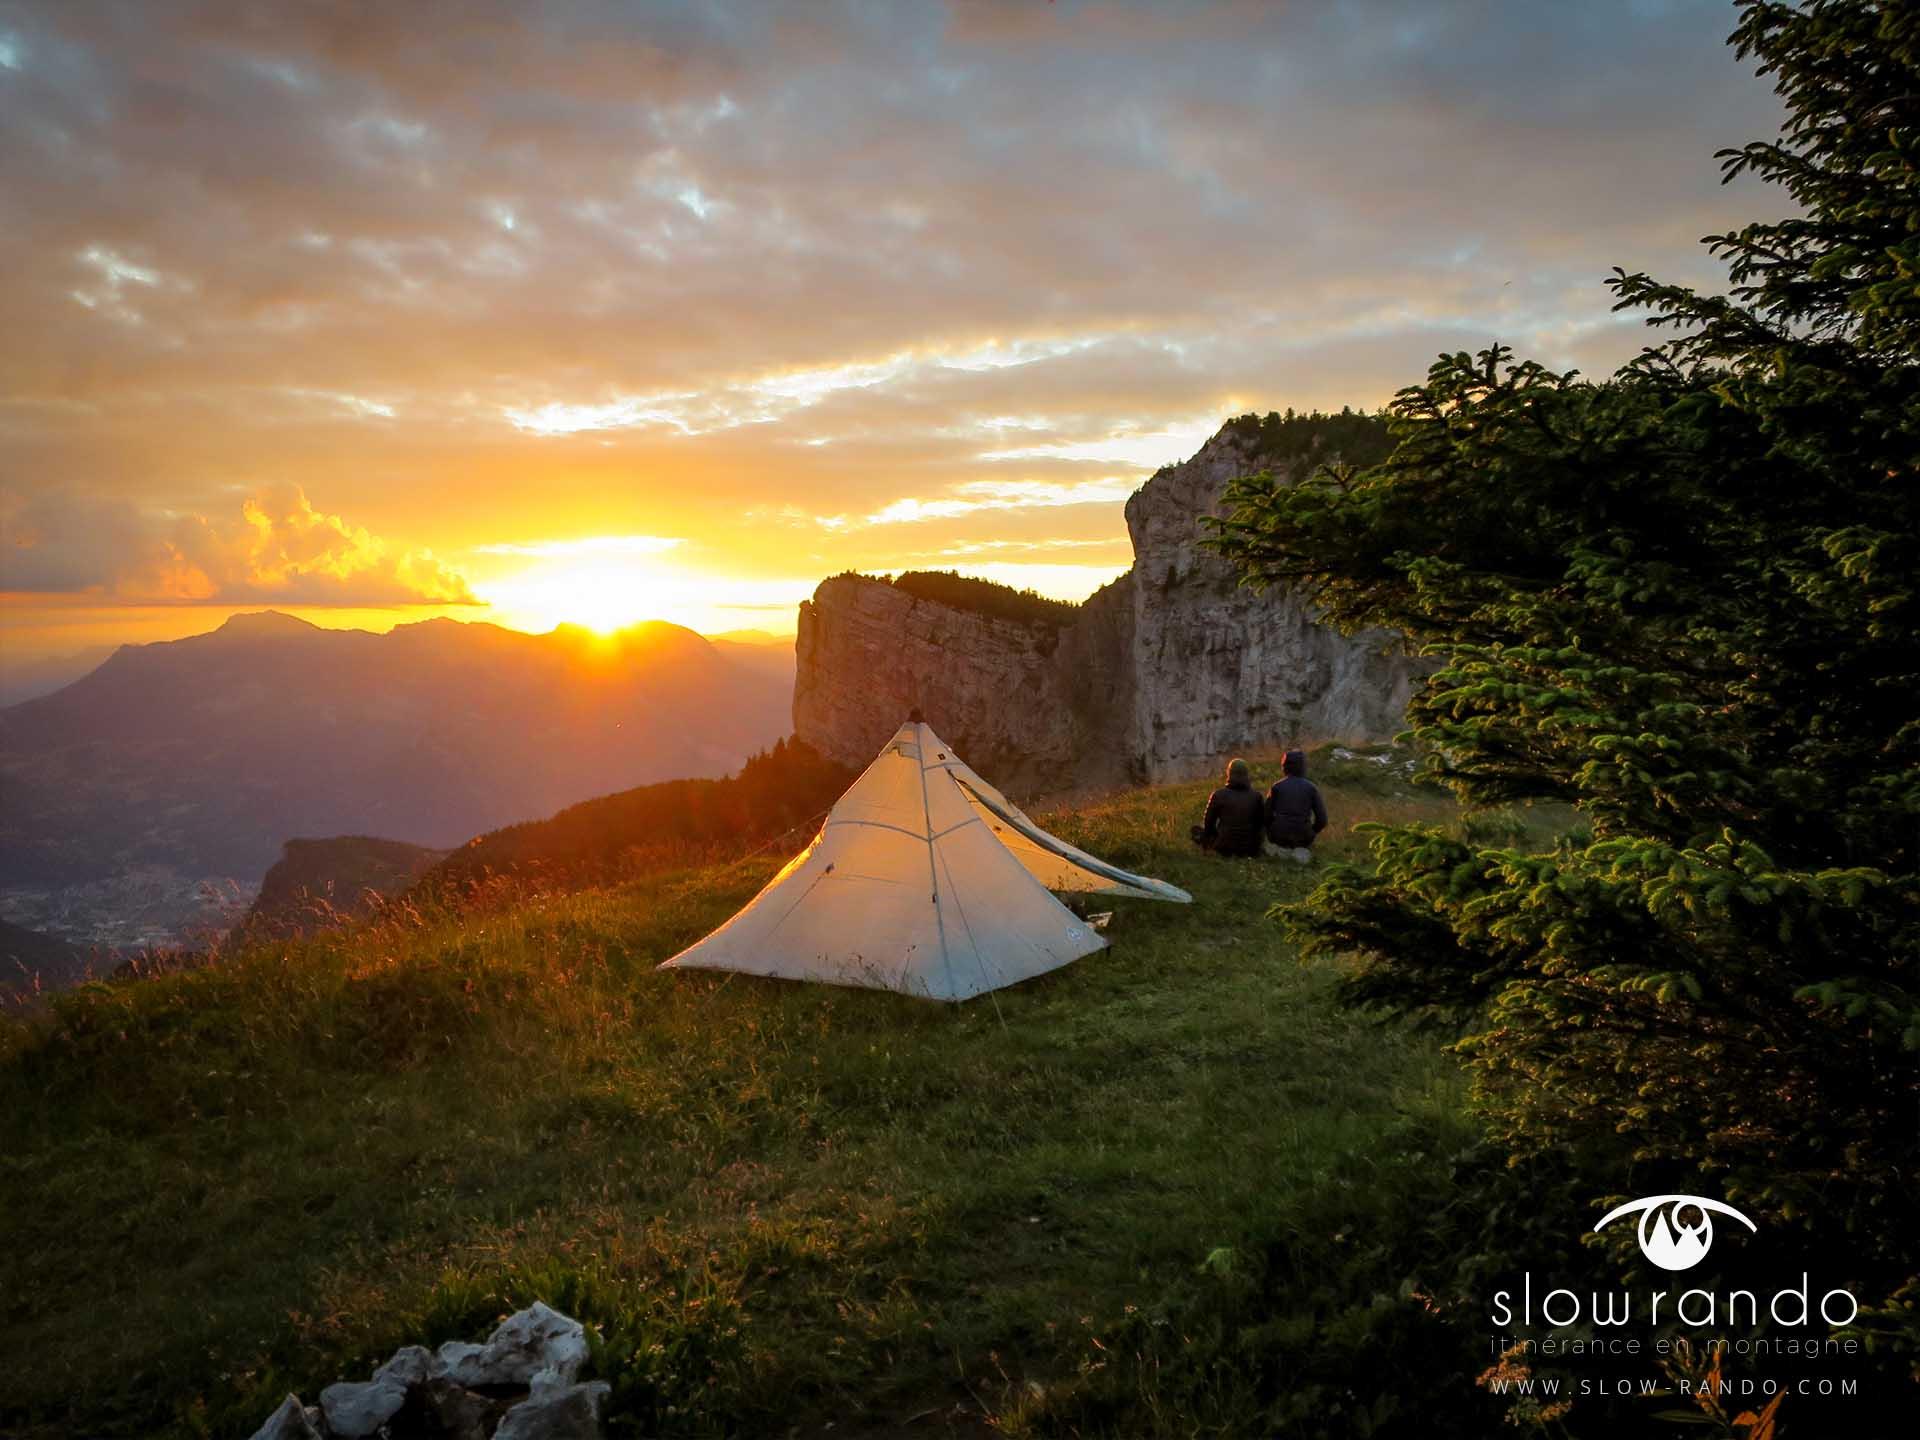 Stage Formation Itinerance Montagne Bivouac Coucher Soleil Vercors N1 Slow Rando